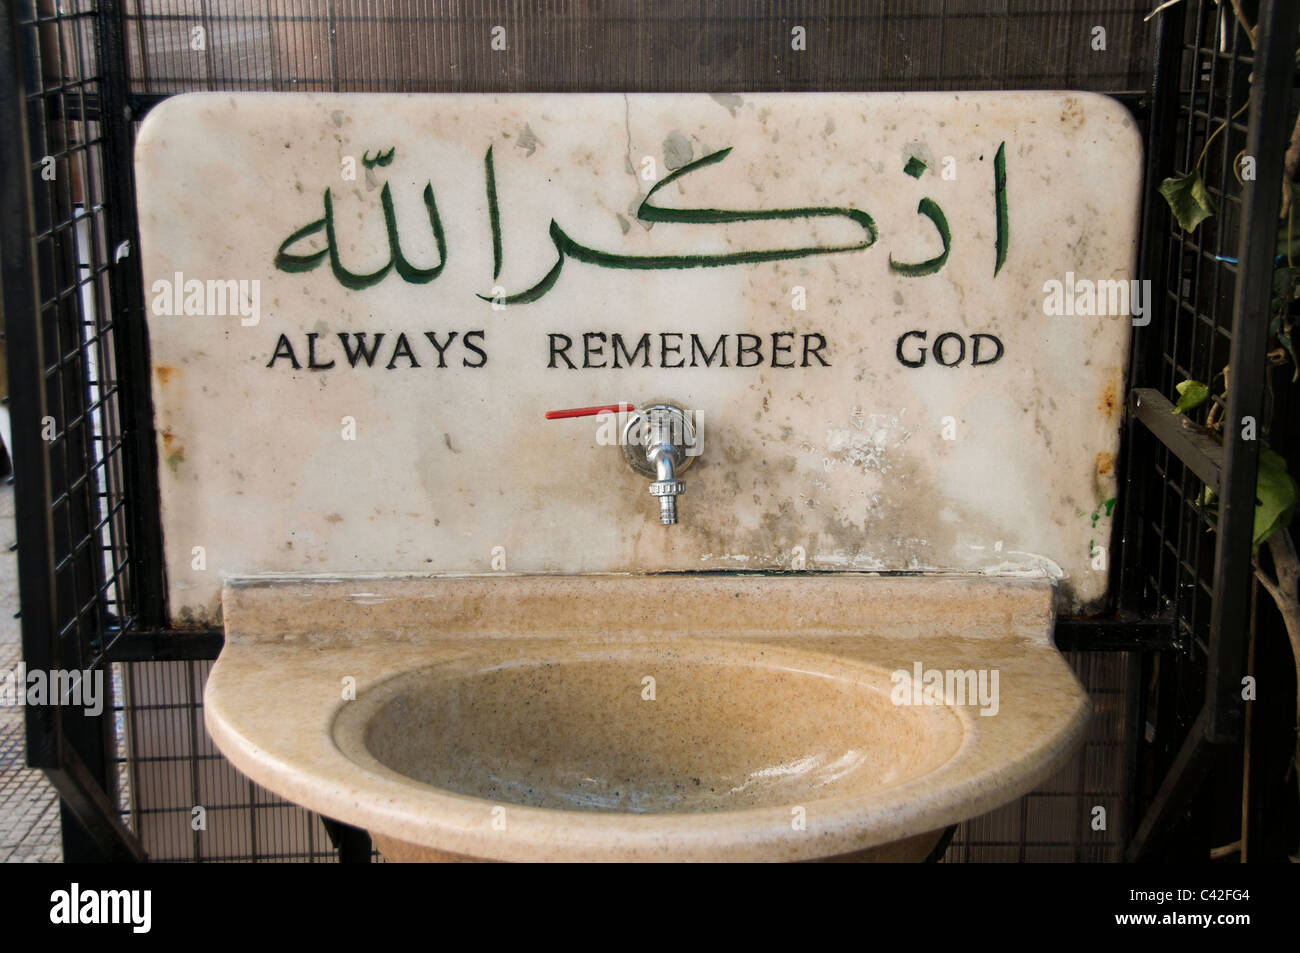 Damaskus-Syrien-Wasser Brunnen Schiff immer an Gott erinnern Stockbild